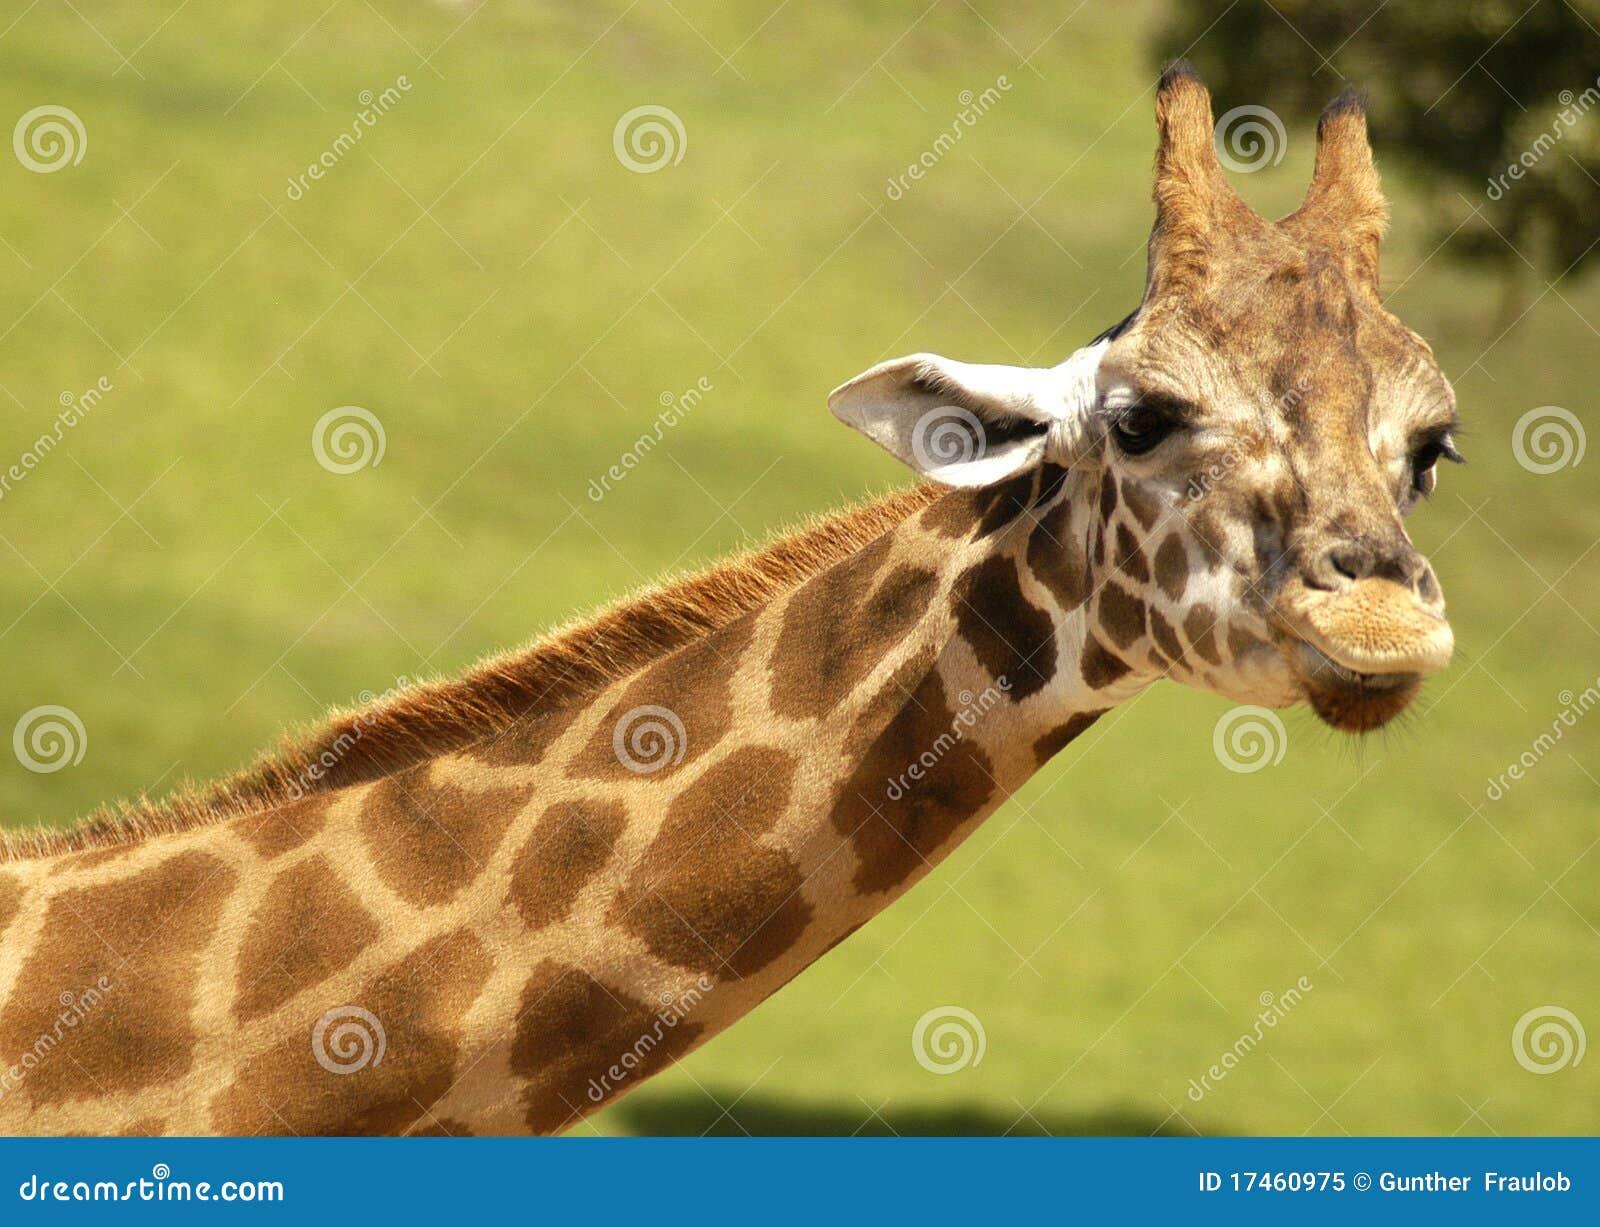 Giraffe With Heart Shaped Markings Royalty Free Stock